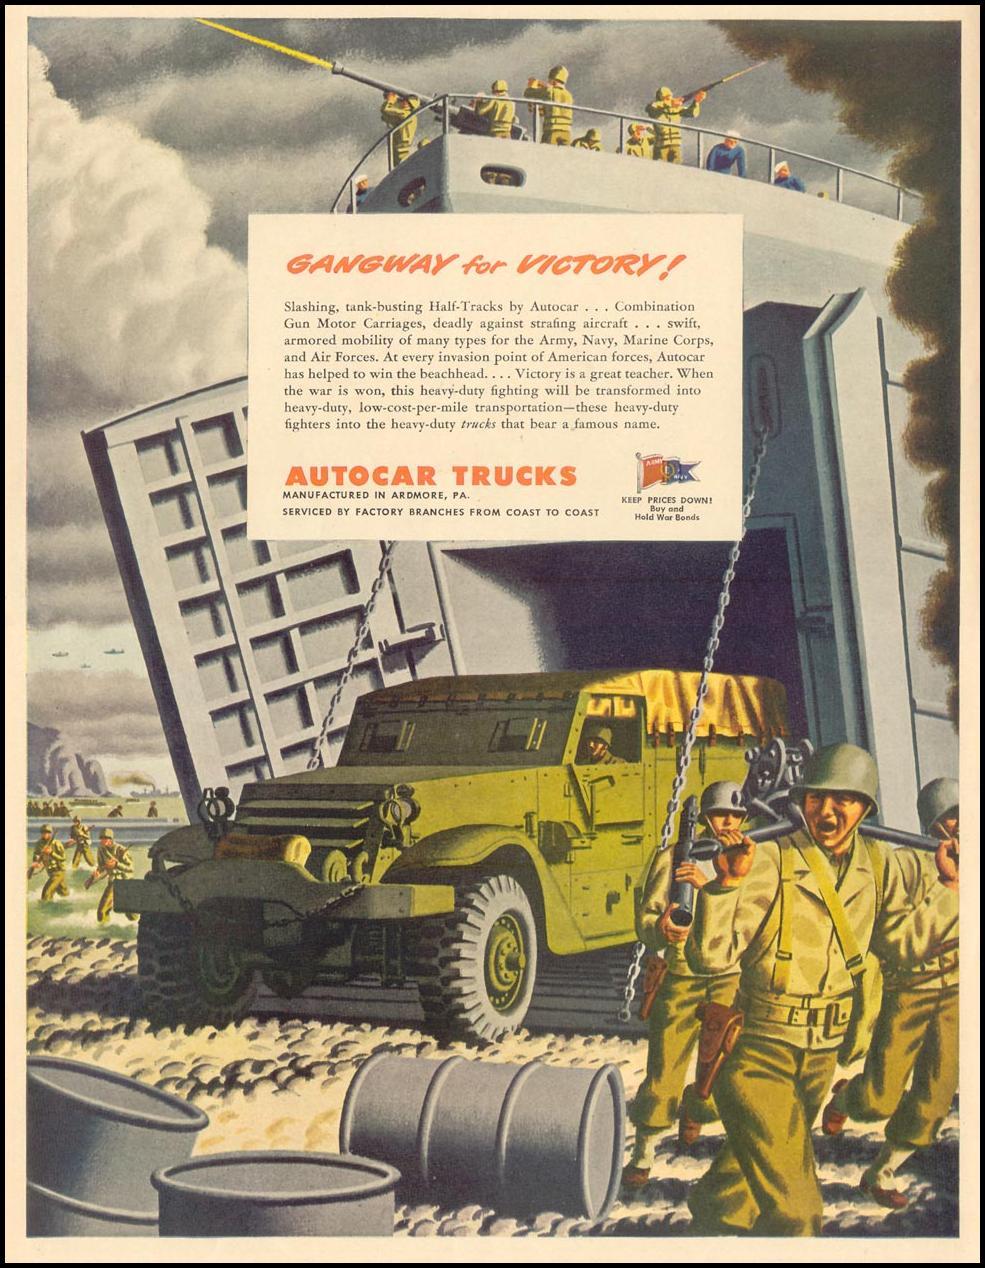 AUTOCAR TRUCKS LIFE 02/28/1944